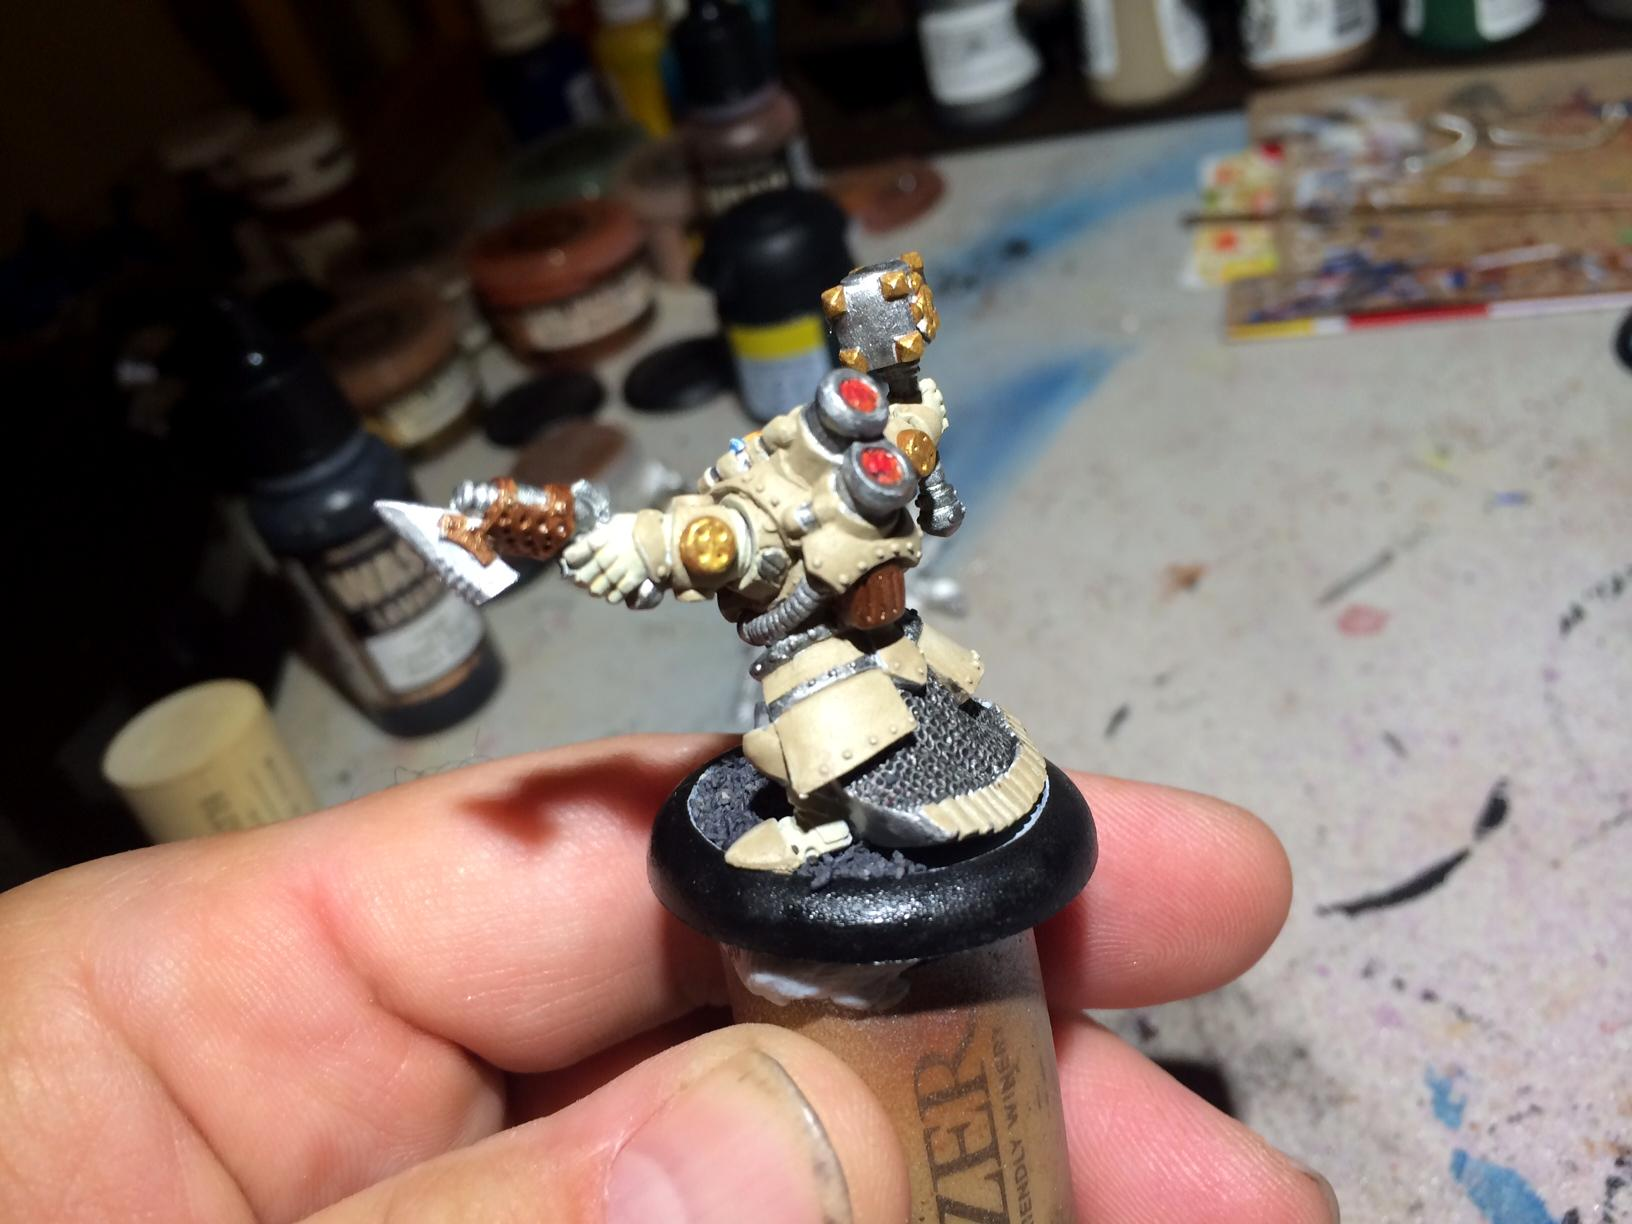 Gorton, Mercenary, Privateer Press, Rhulic, Warmachine